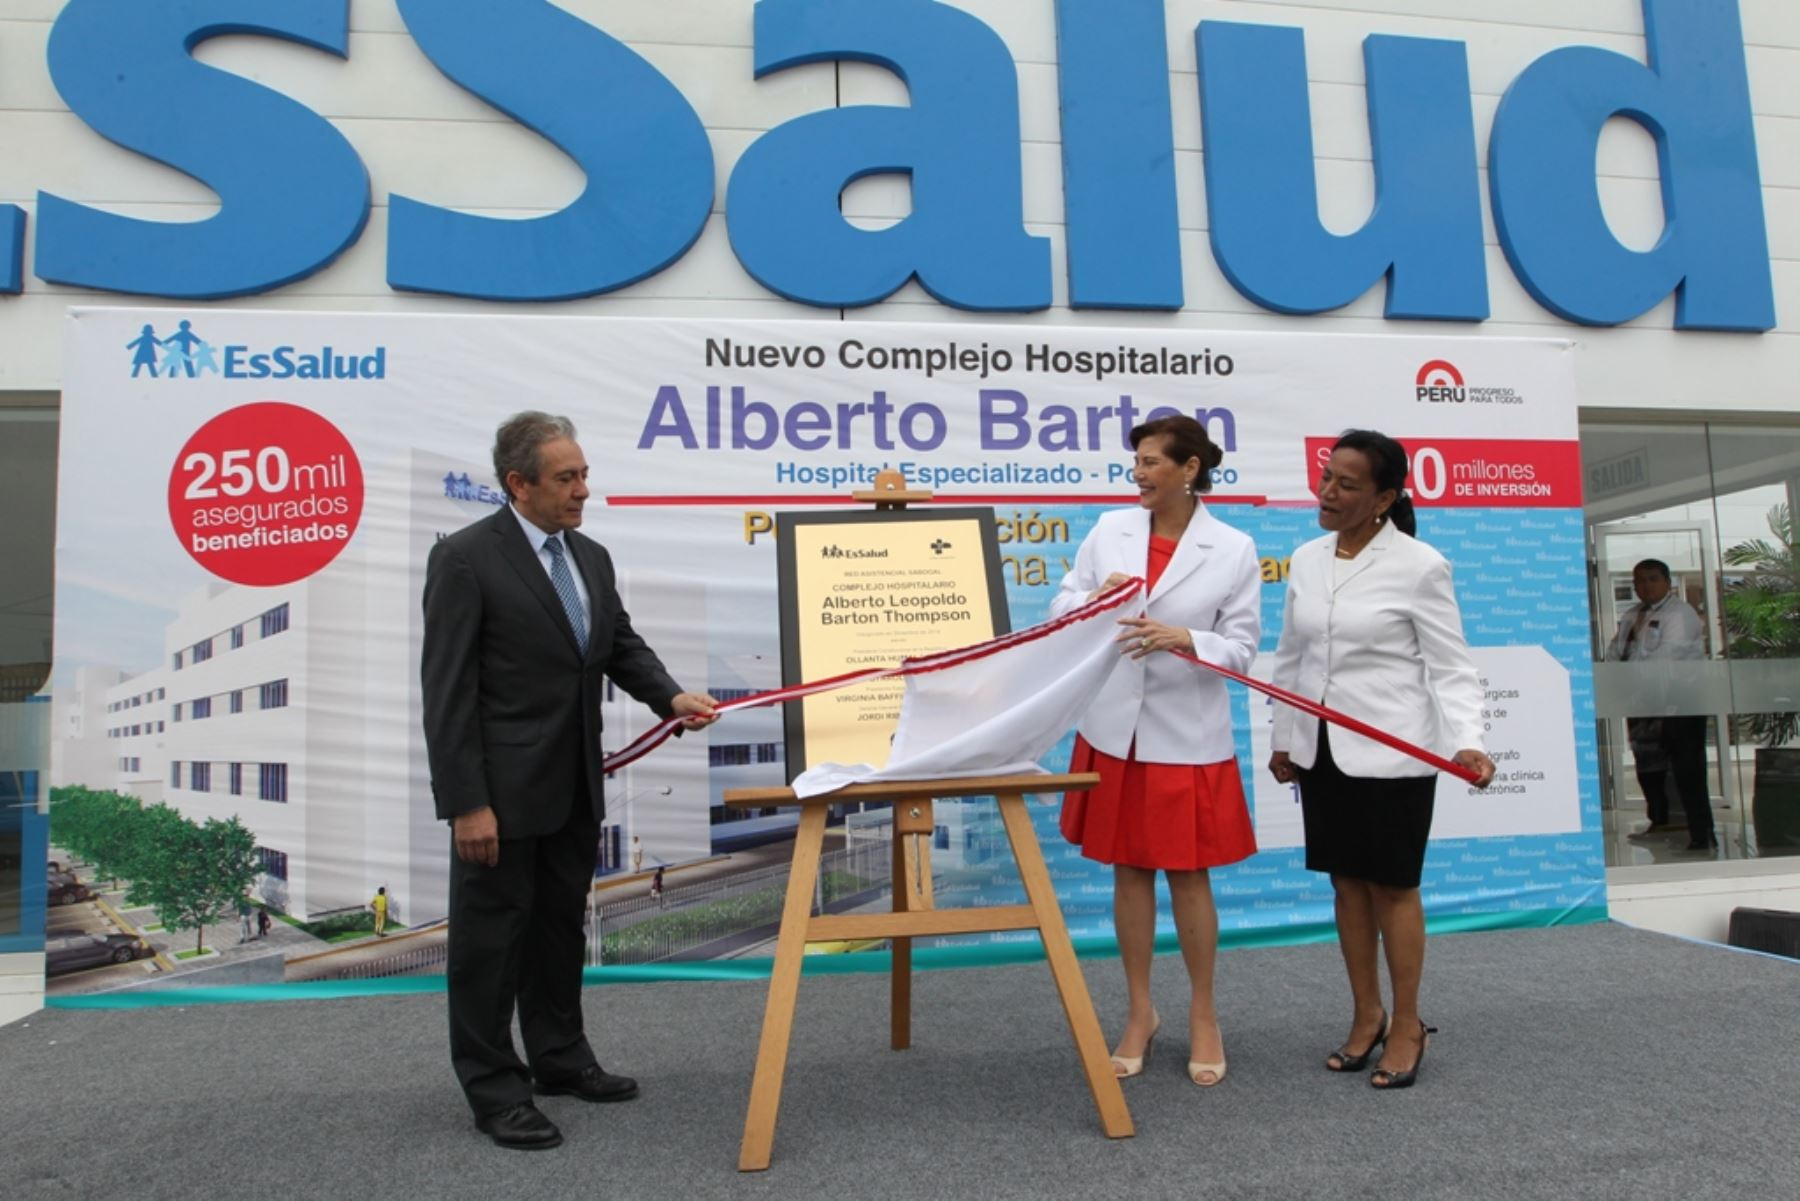 Presidenta ejecutiva de EsSalud, Virginia Baffigo, inaugura nuevo complejo hospitalario Alberto Barton Thompson.